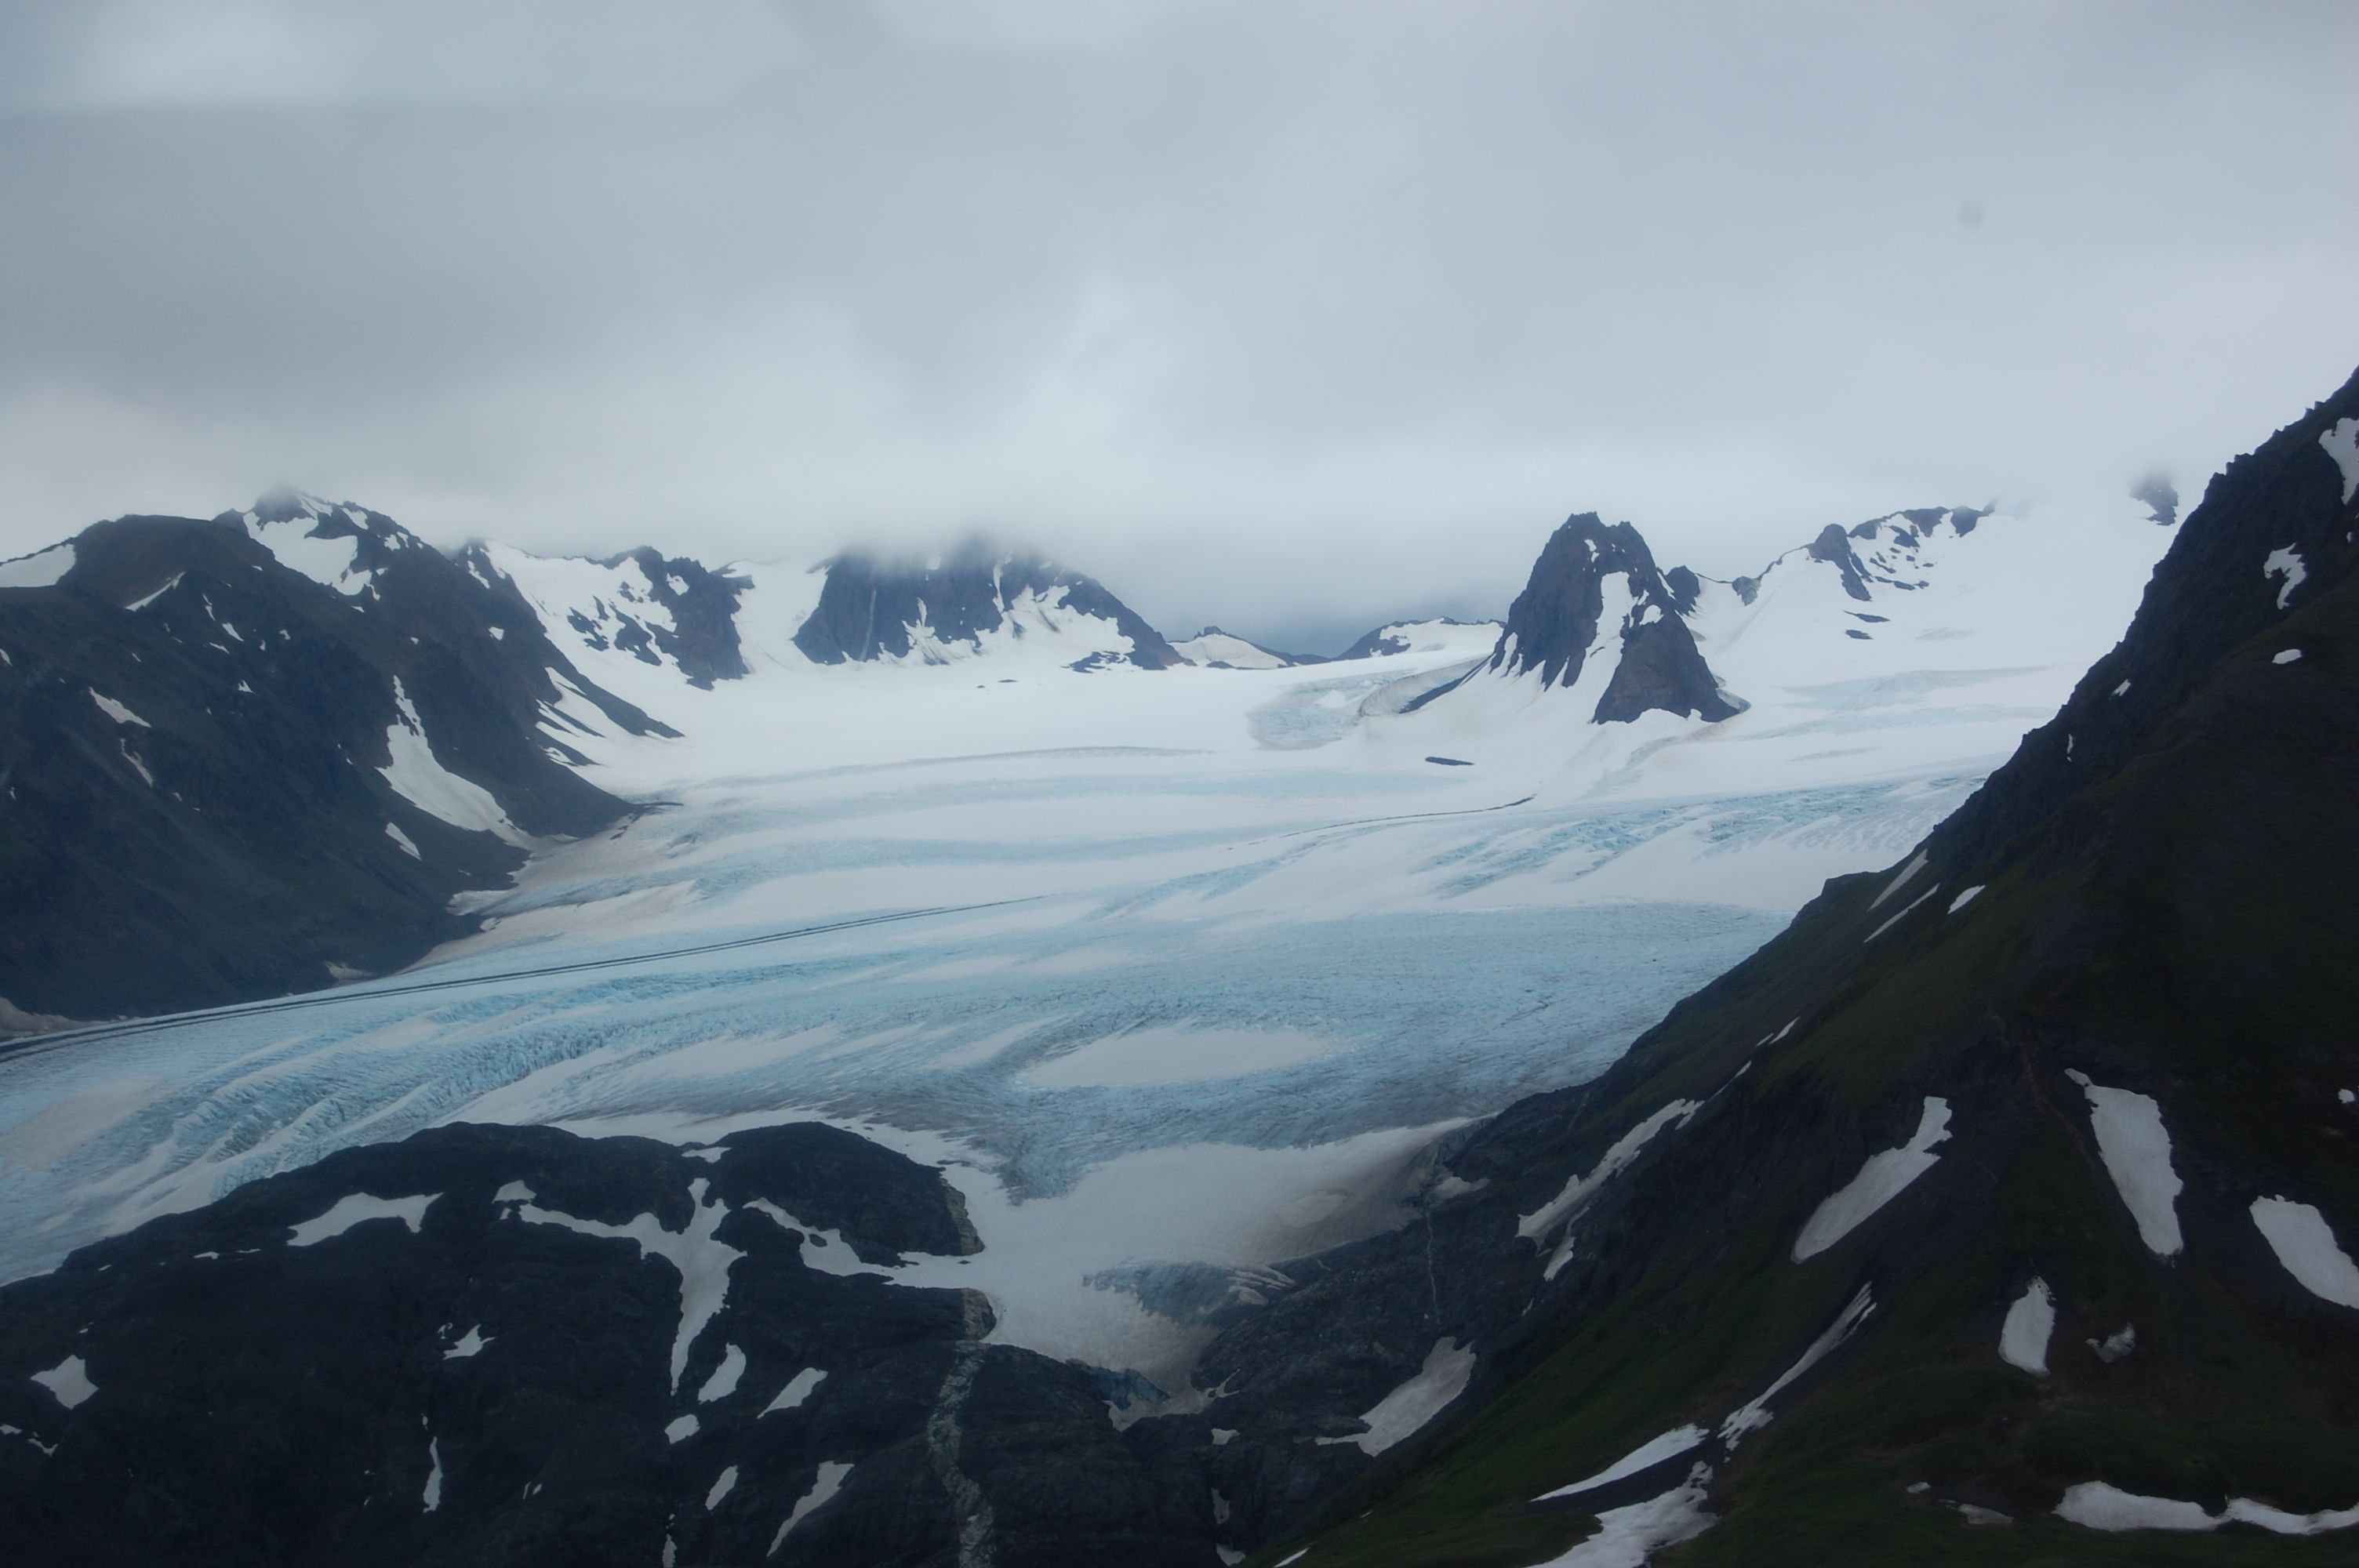 Glacier: Glacier Image by Matthew Verso The post Glacier appeared first on BookCheapTravels.com. #landscape_photos #Glacier